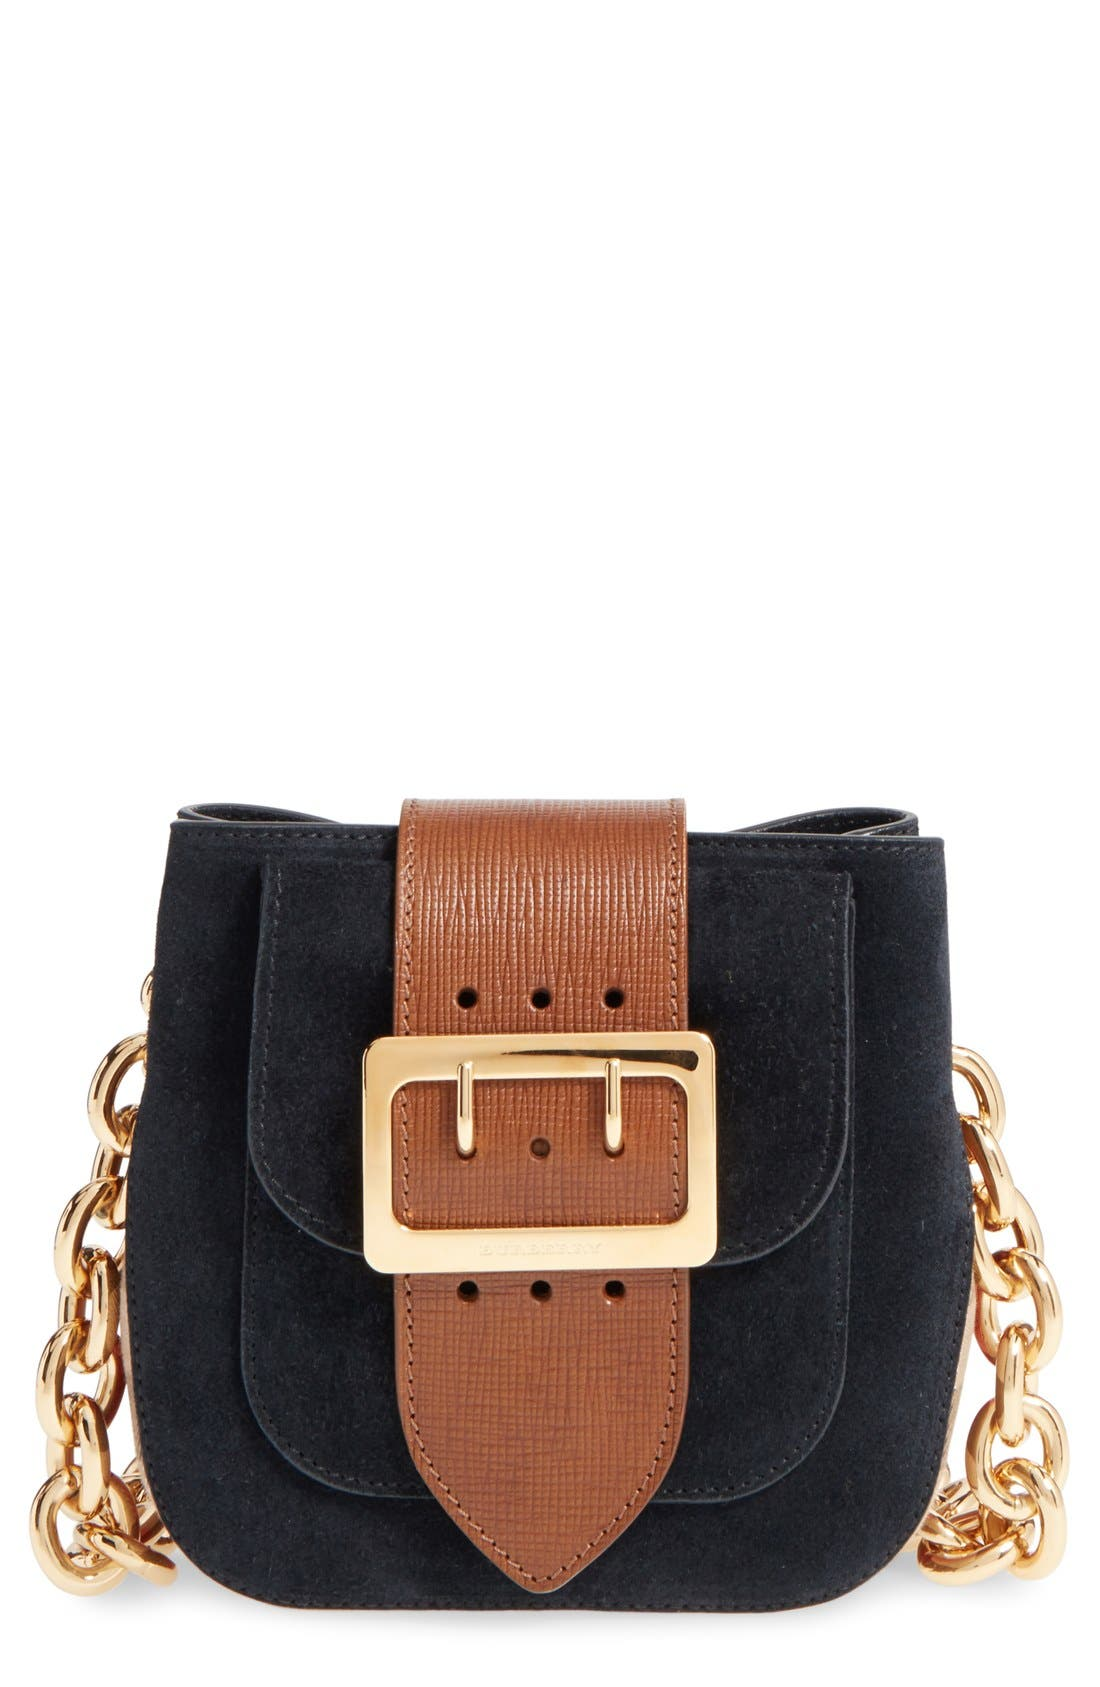 Main Image - Burberry Suede & Canvas Convertible Crossbody Bag